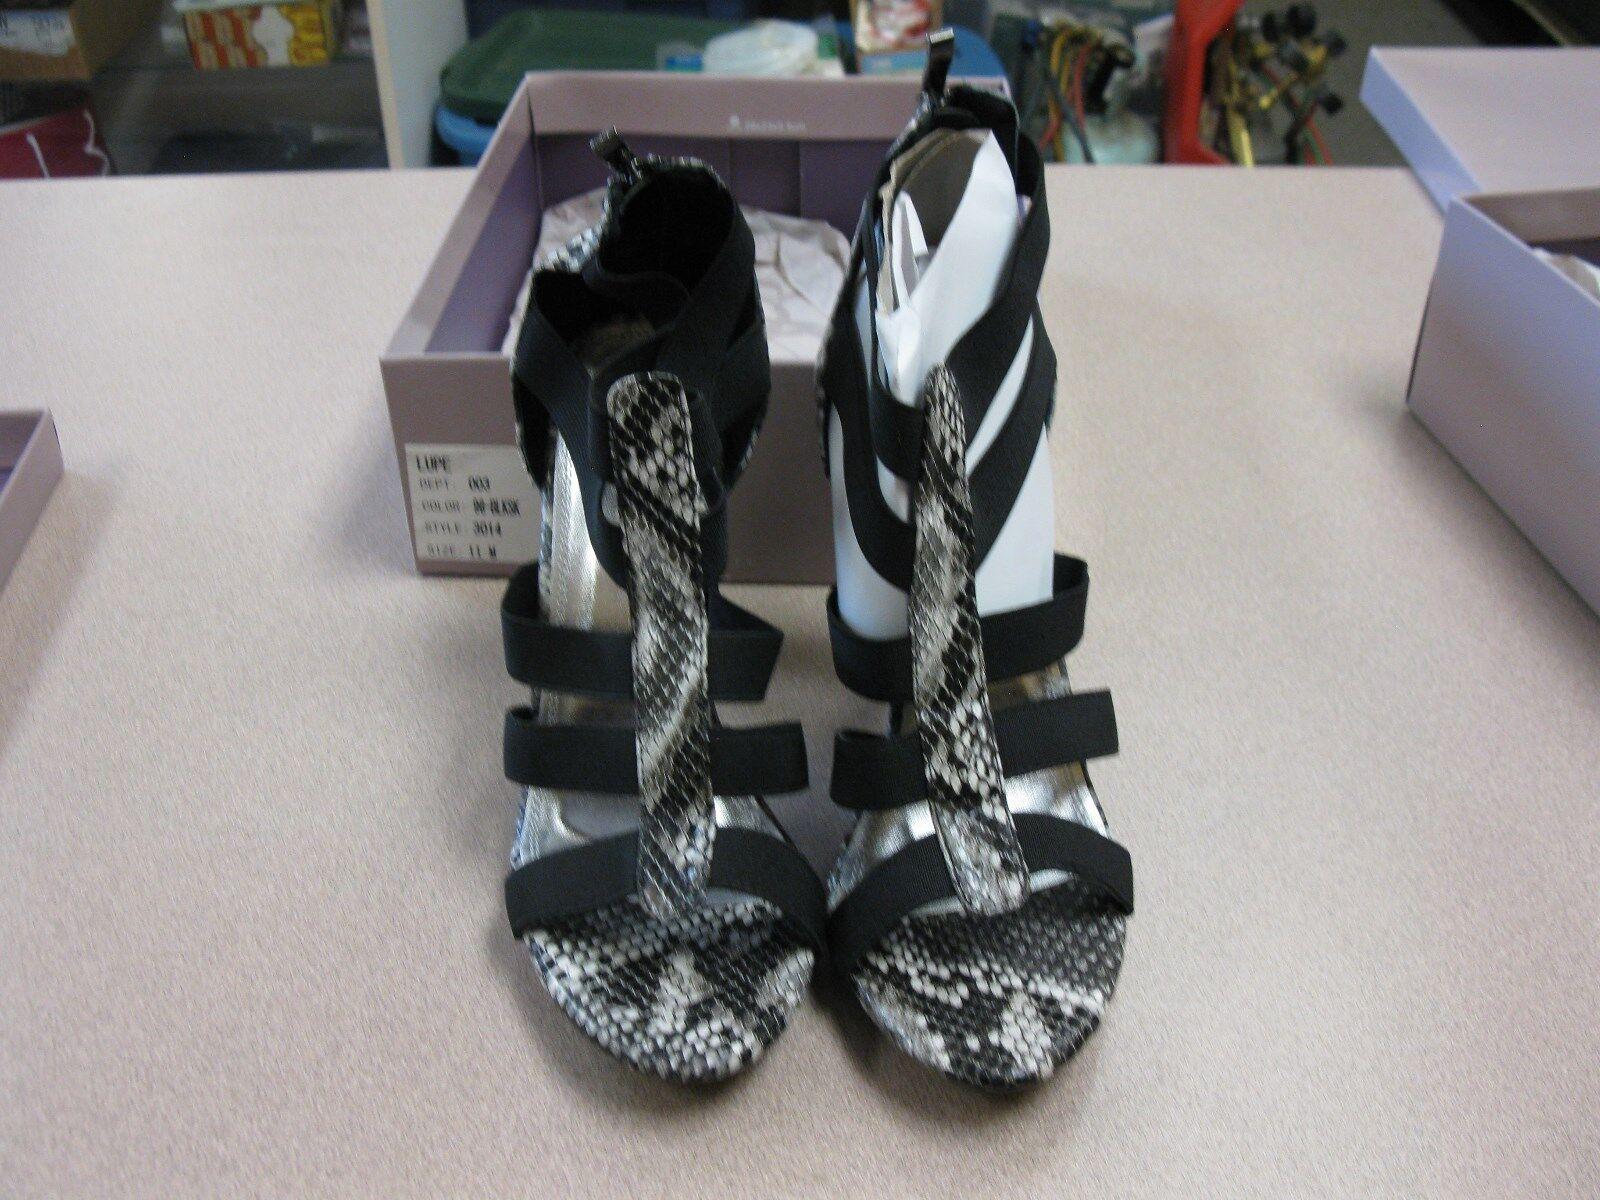 Women's Bakers Black High Heels shoes Sandals Size Size Size 11M  Lupe  9de632